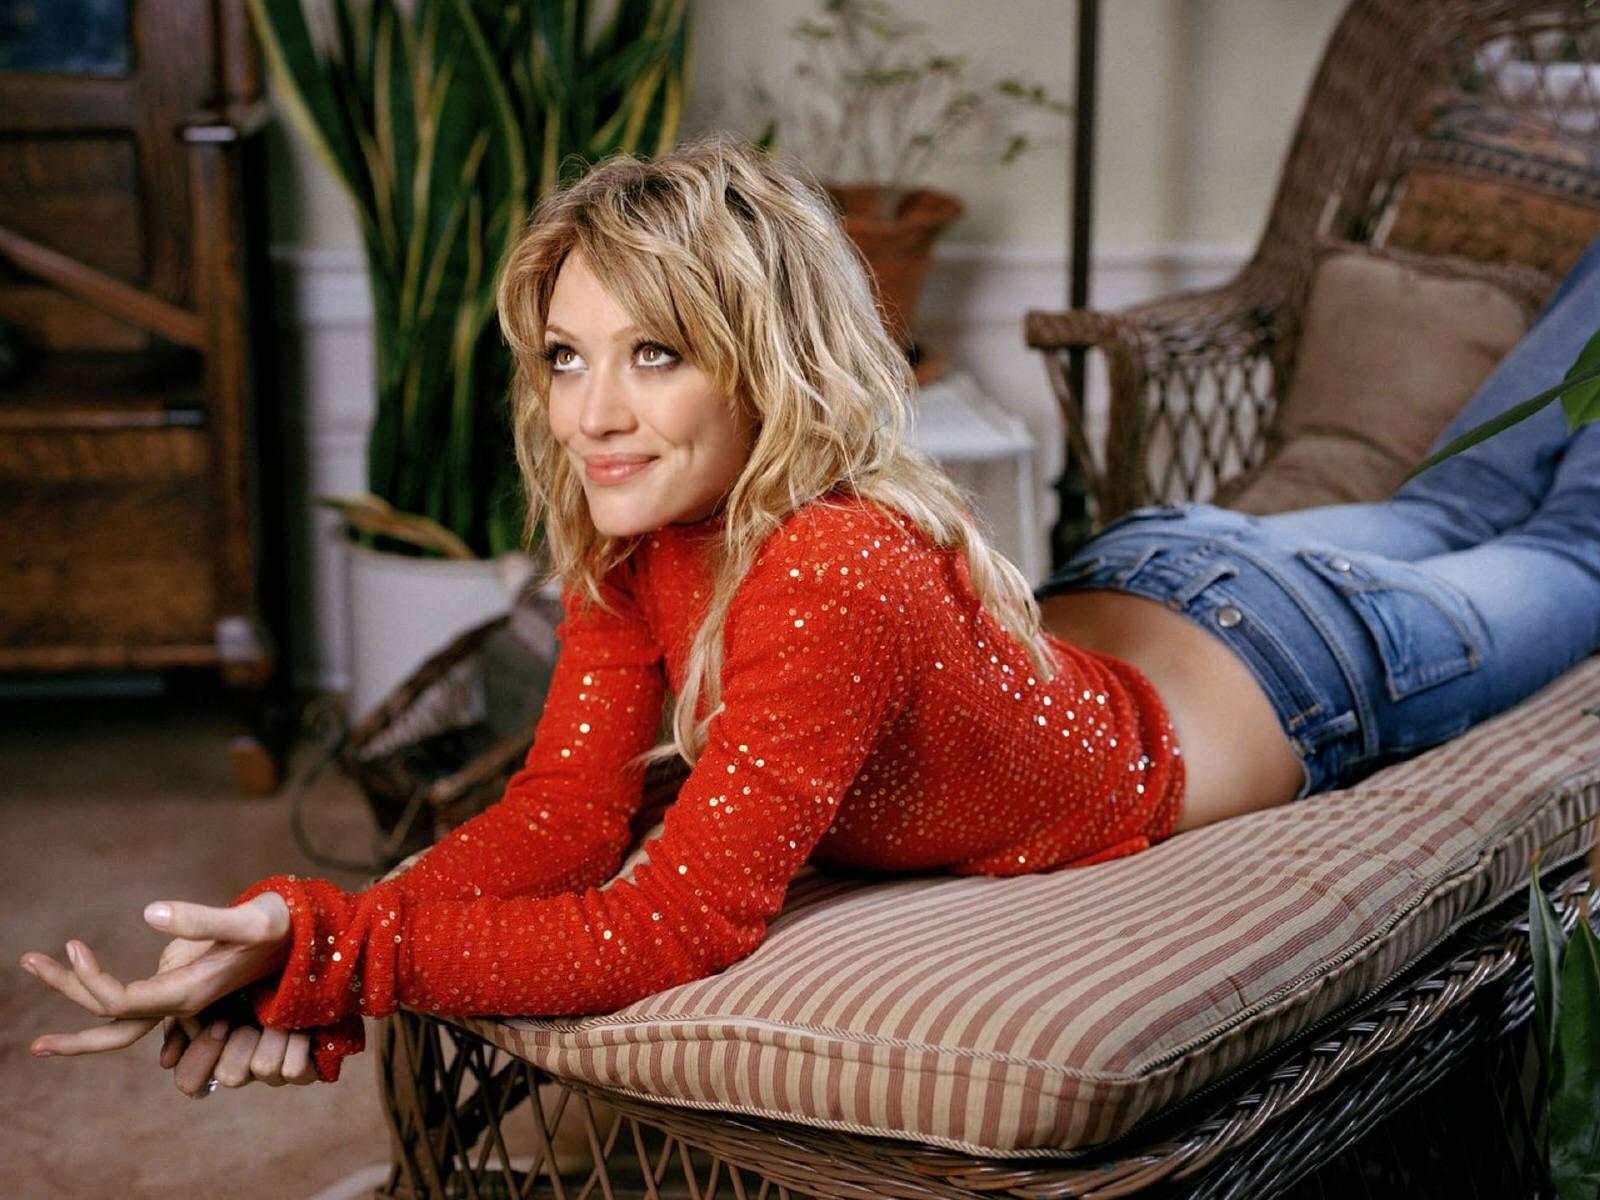 Wallpaper di Hilary Duff - 66